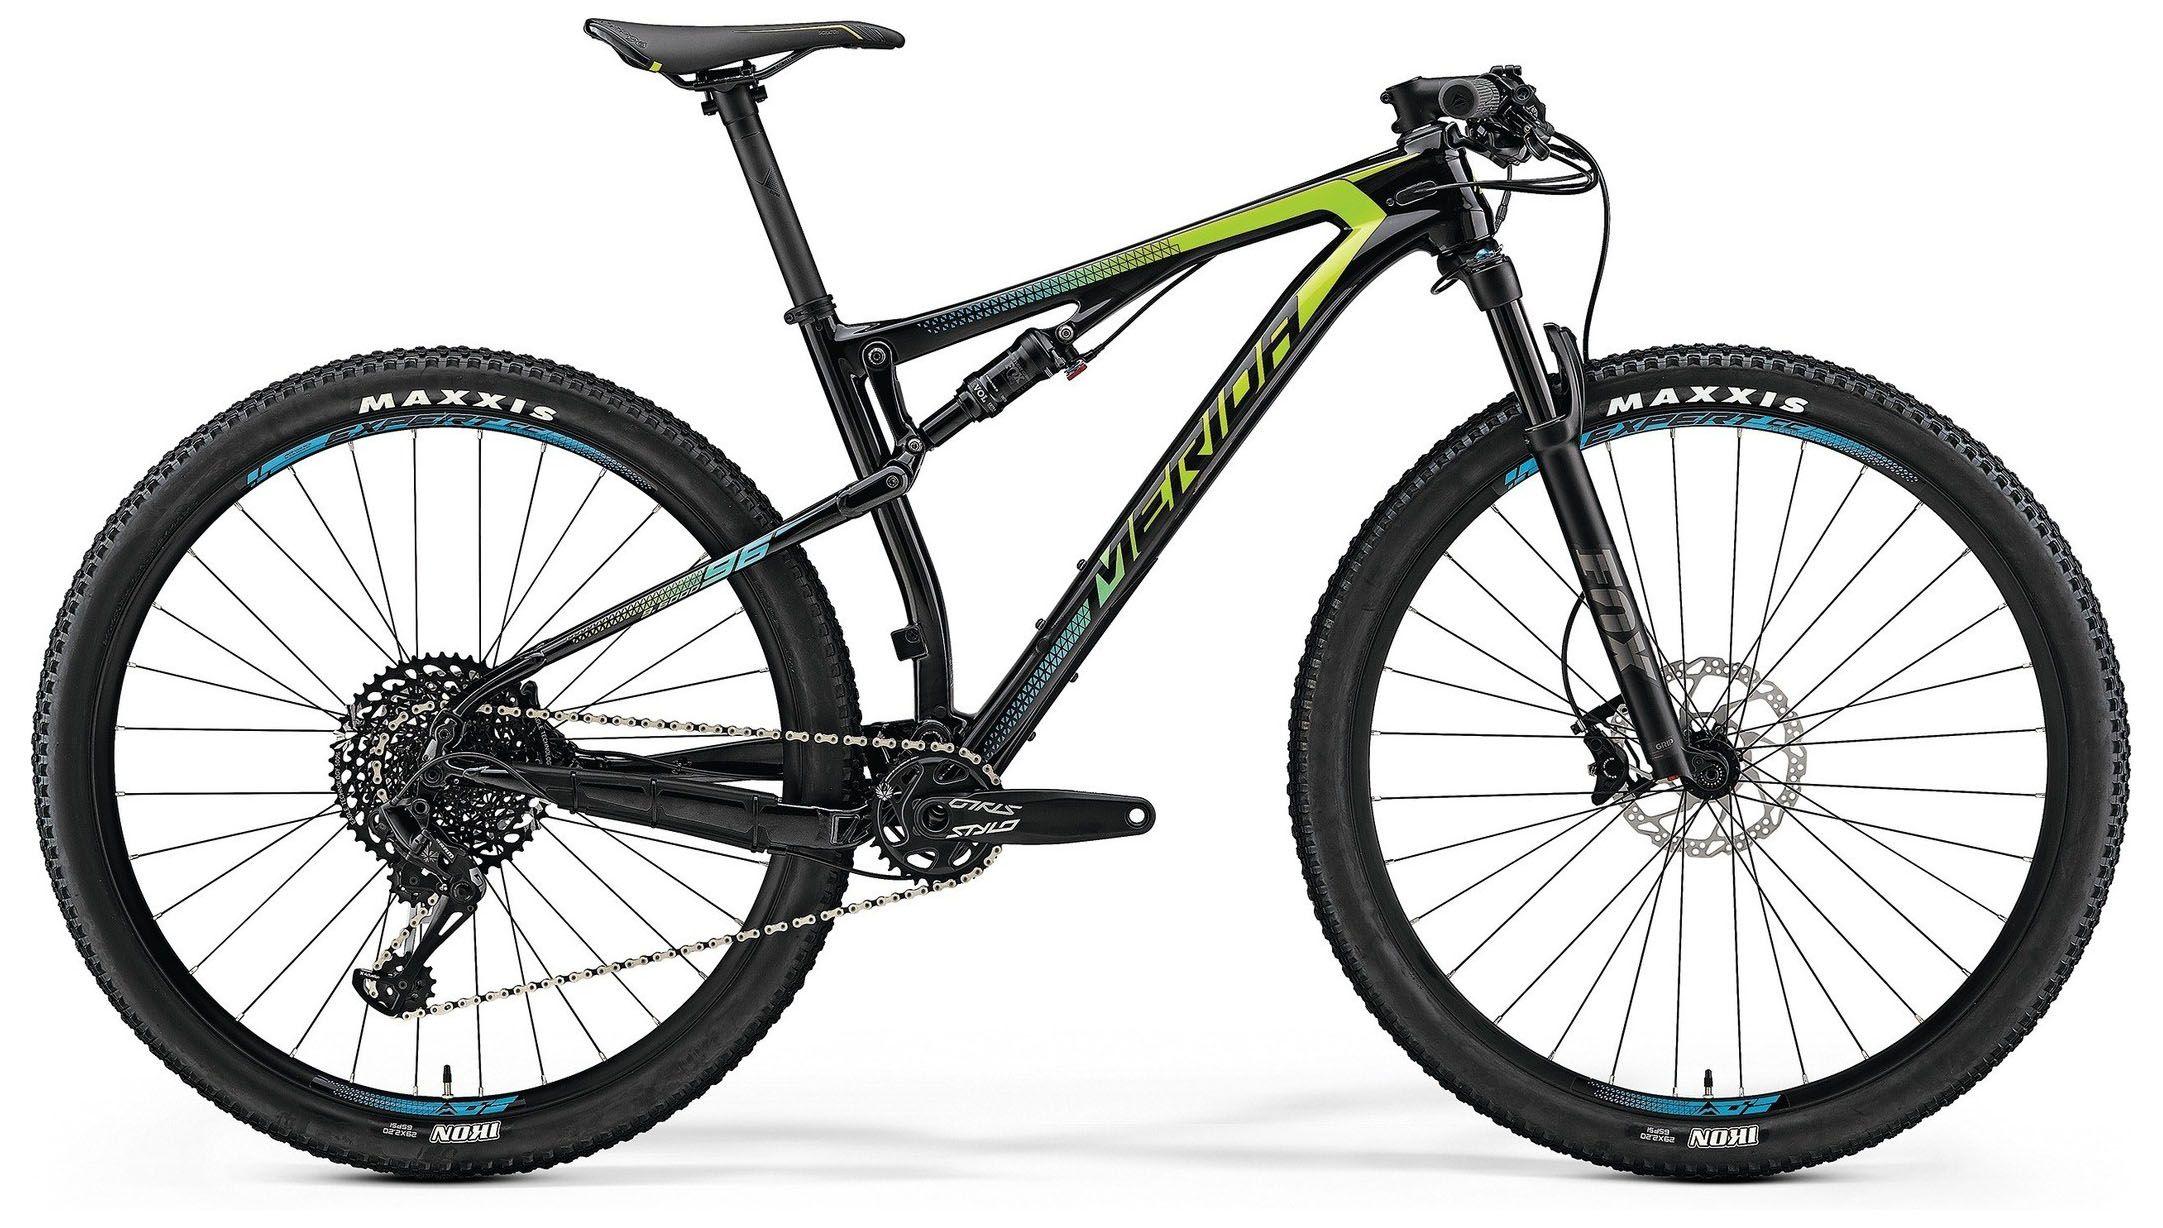 Велосипед Merida Ninety-Six 9.6000 2018,  Двухподвесы  - артикул:287961